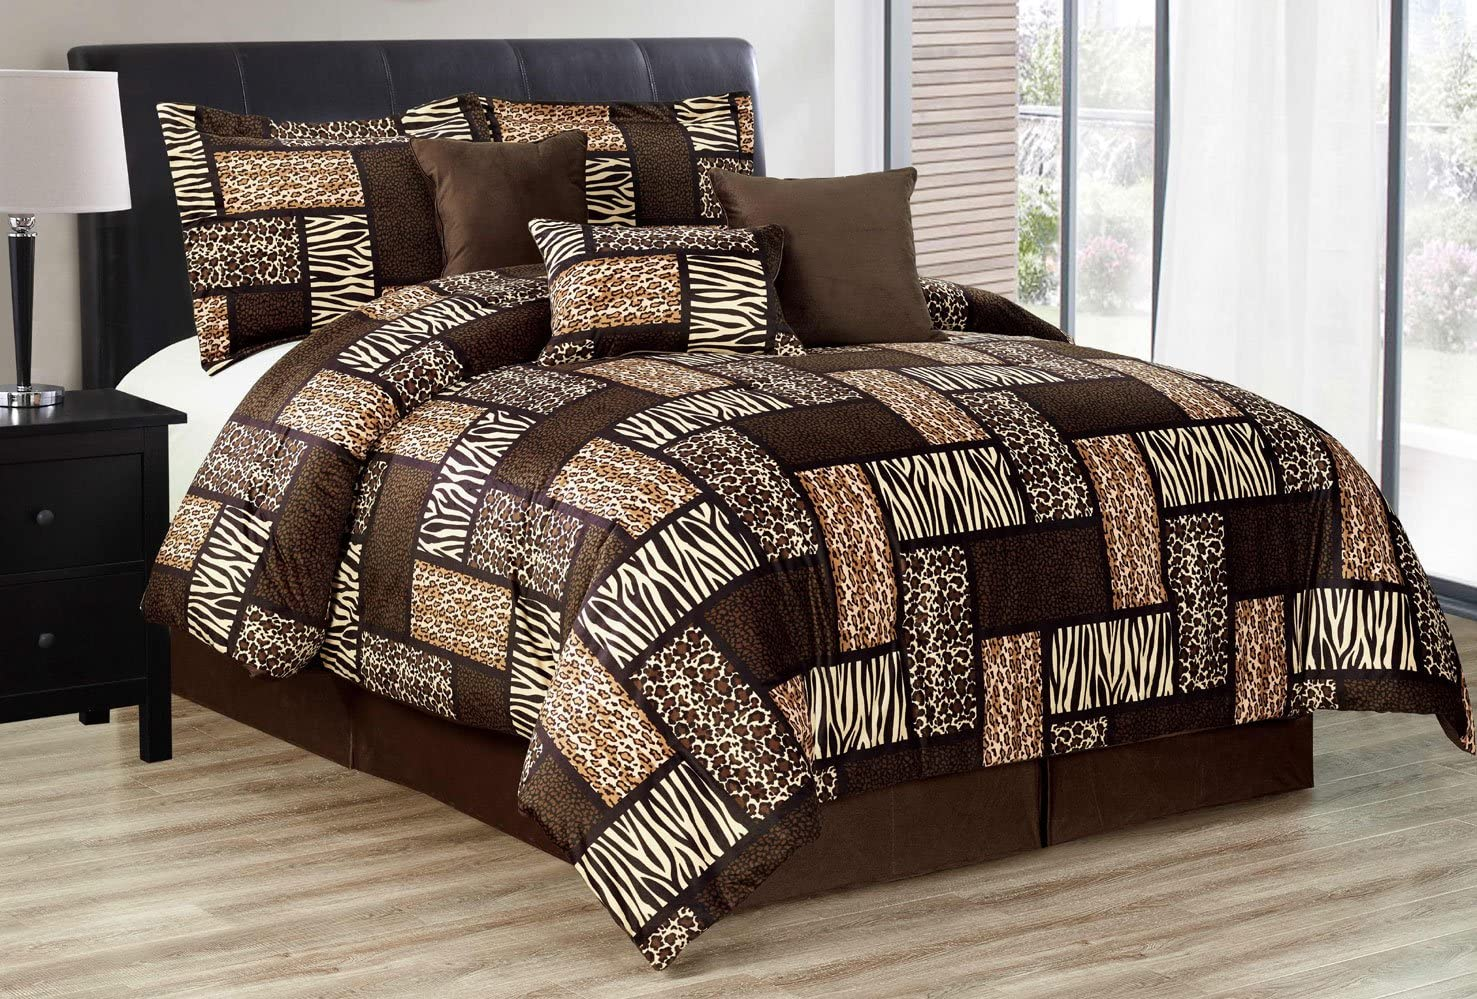 7 Pieces Multi Animal print Comforter set KING size Bedding Brown, Black,  White -Zebra, Leopard, Tiger, Cheetah Etc.